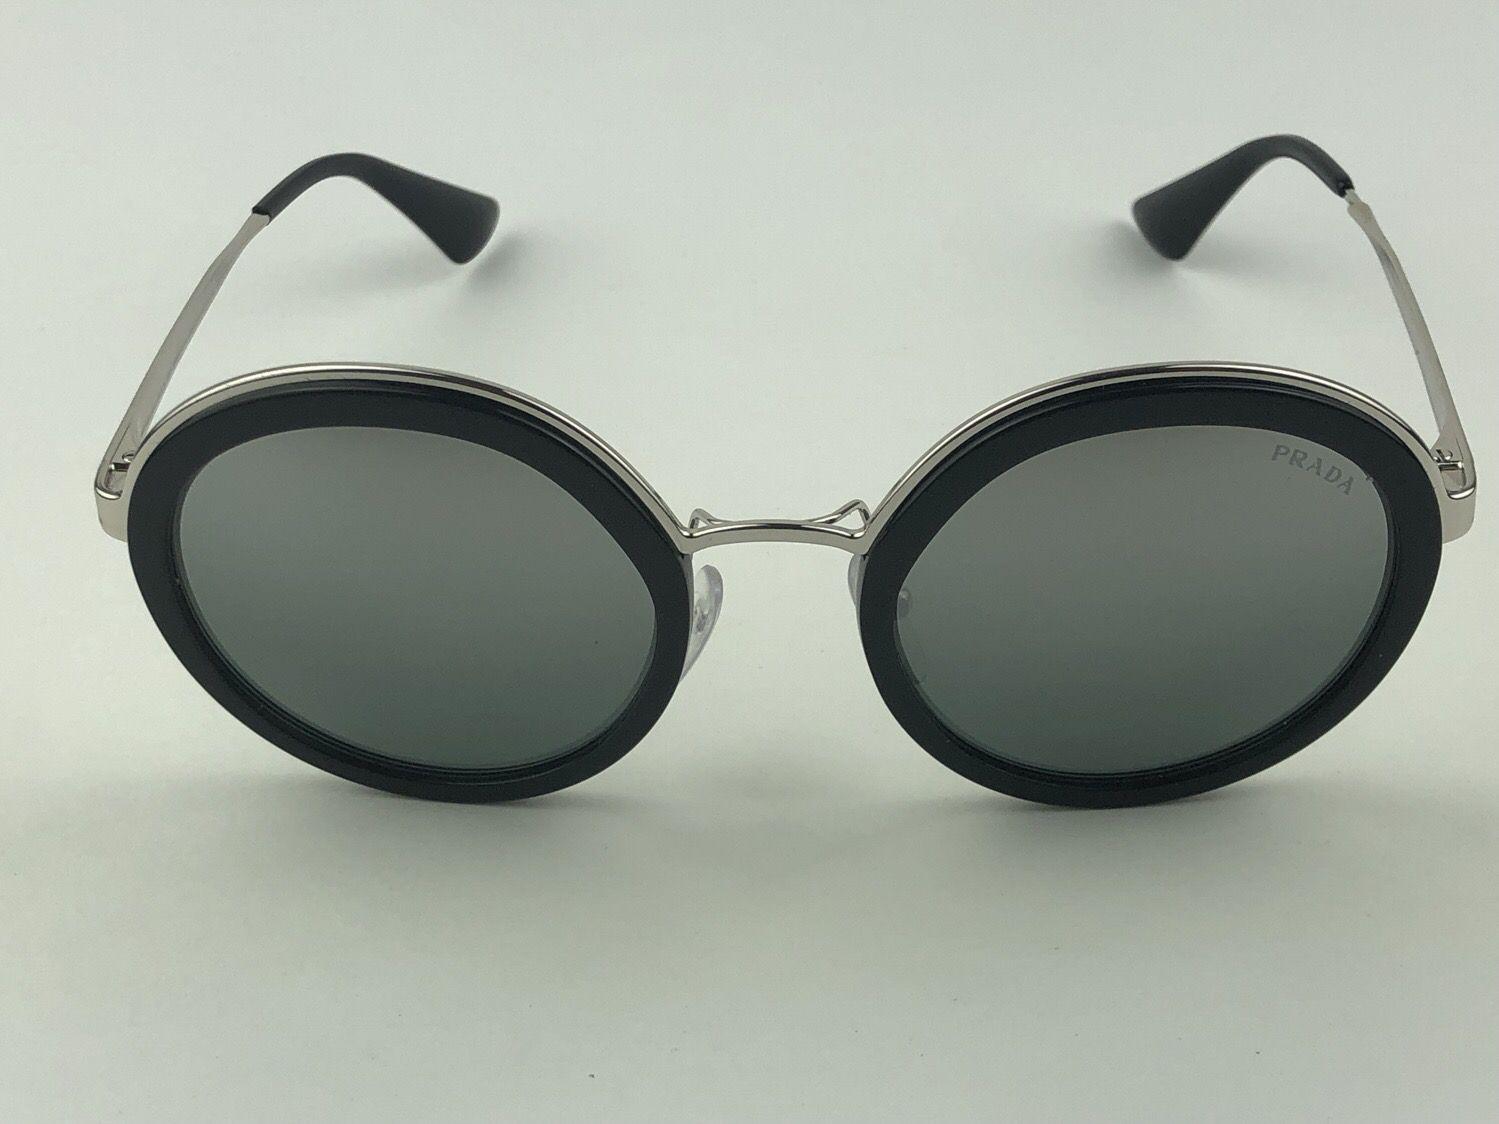 2f0952b82e9fa Prada - PR50TS - Preto - 1AB-6N2- 54 23 - Óculos de sol - Otica La ...